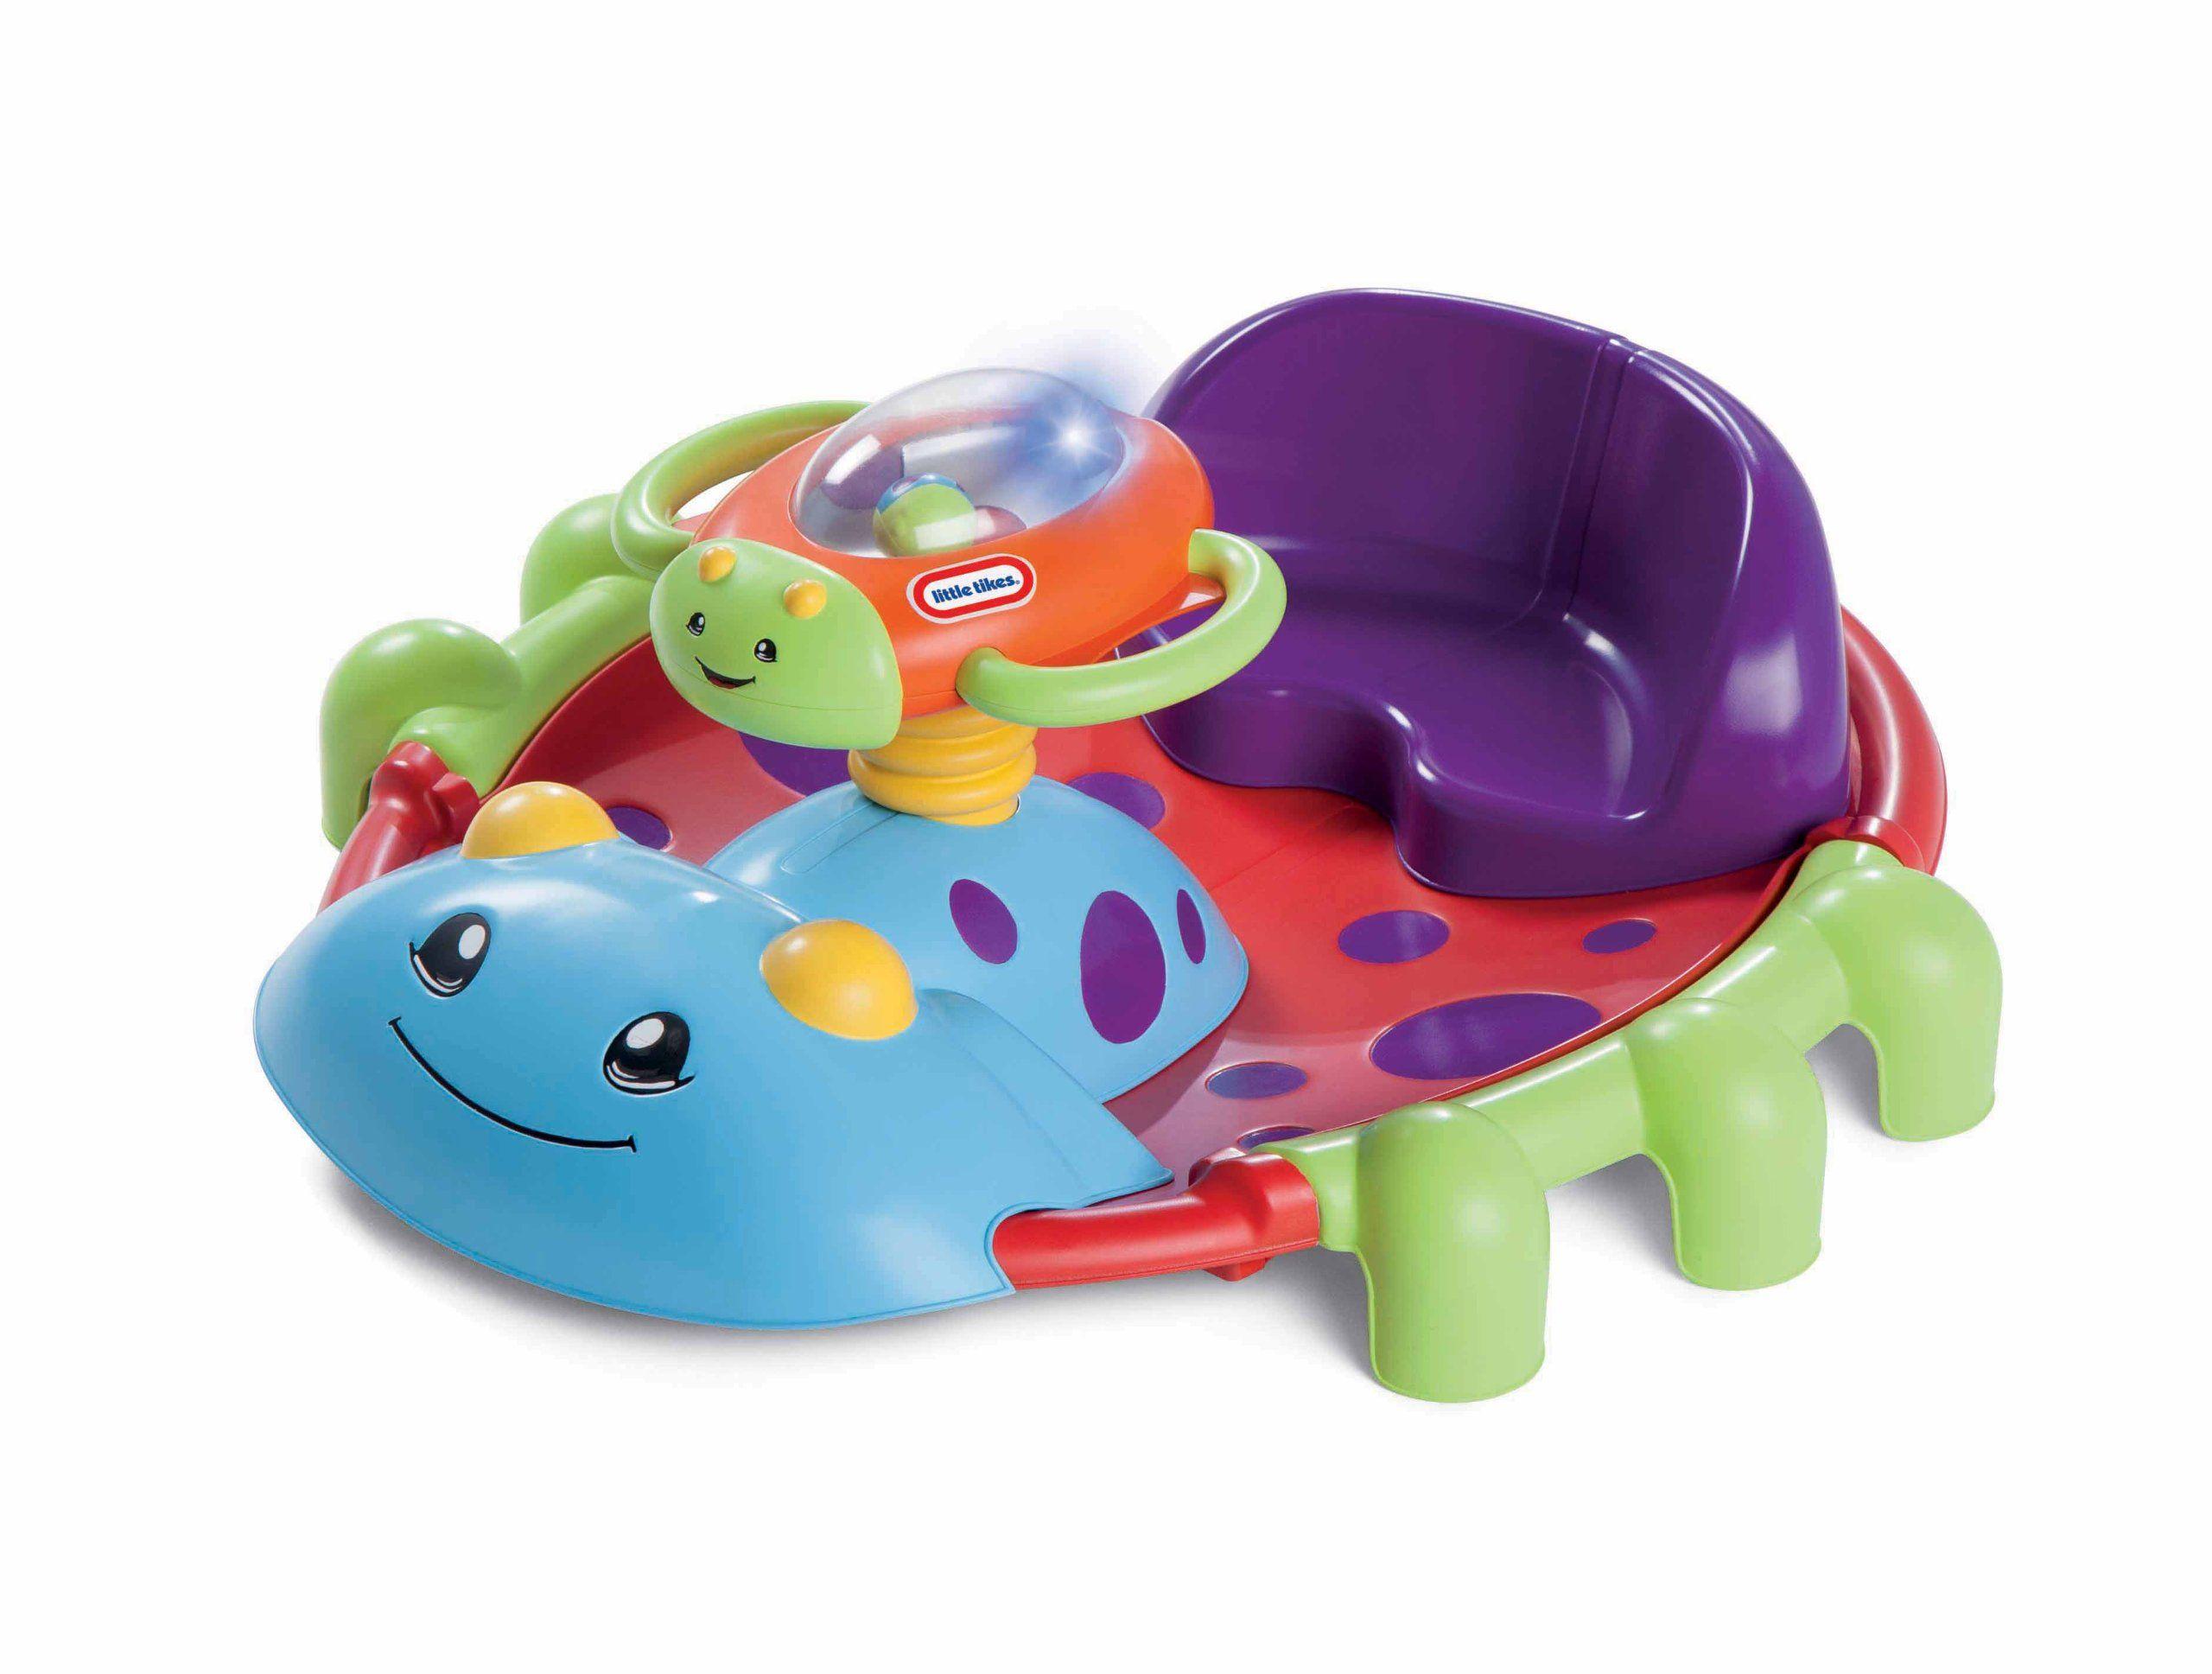 Little Tikes Activity Garden Rock 'n Spin Baby activity